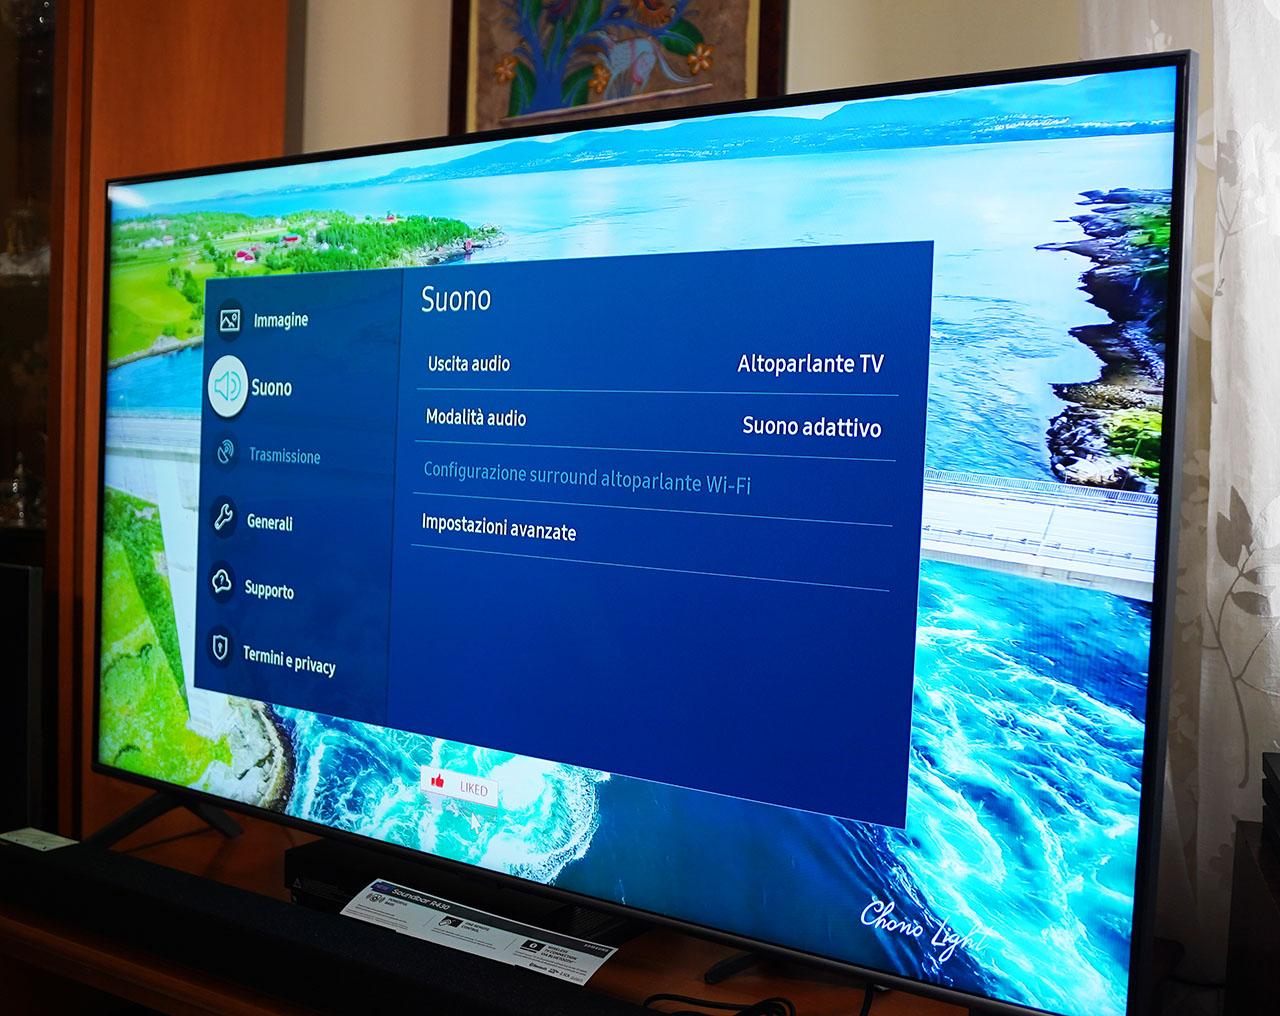 Samsung Q60T 2020 TV QLED 4K HDR Impostazioni Audio